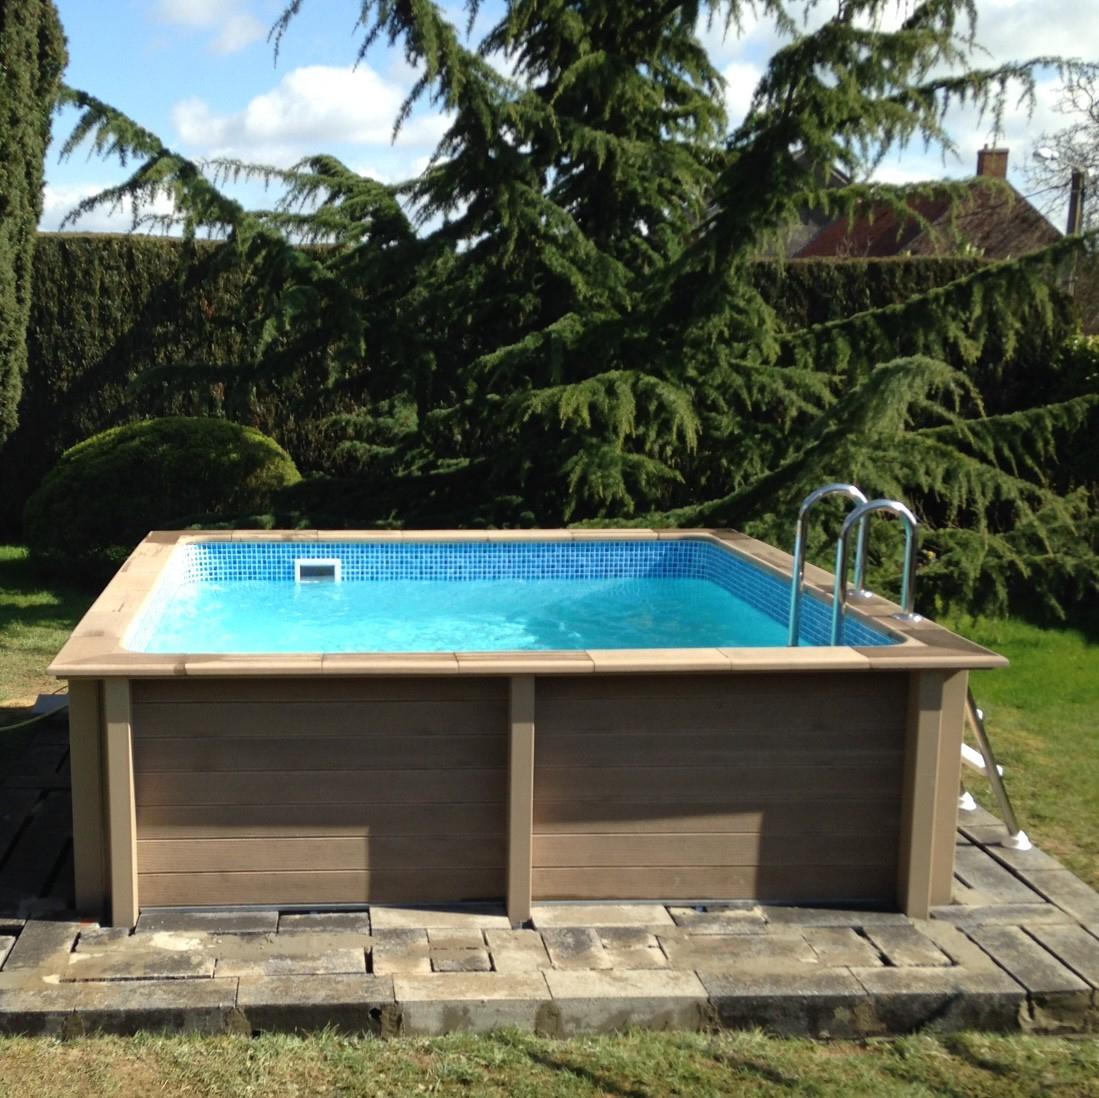 Https://.ma-Piscine-Beton/piscine-Decagonale/2406 ... avec Naturalis Piscine